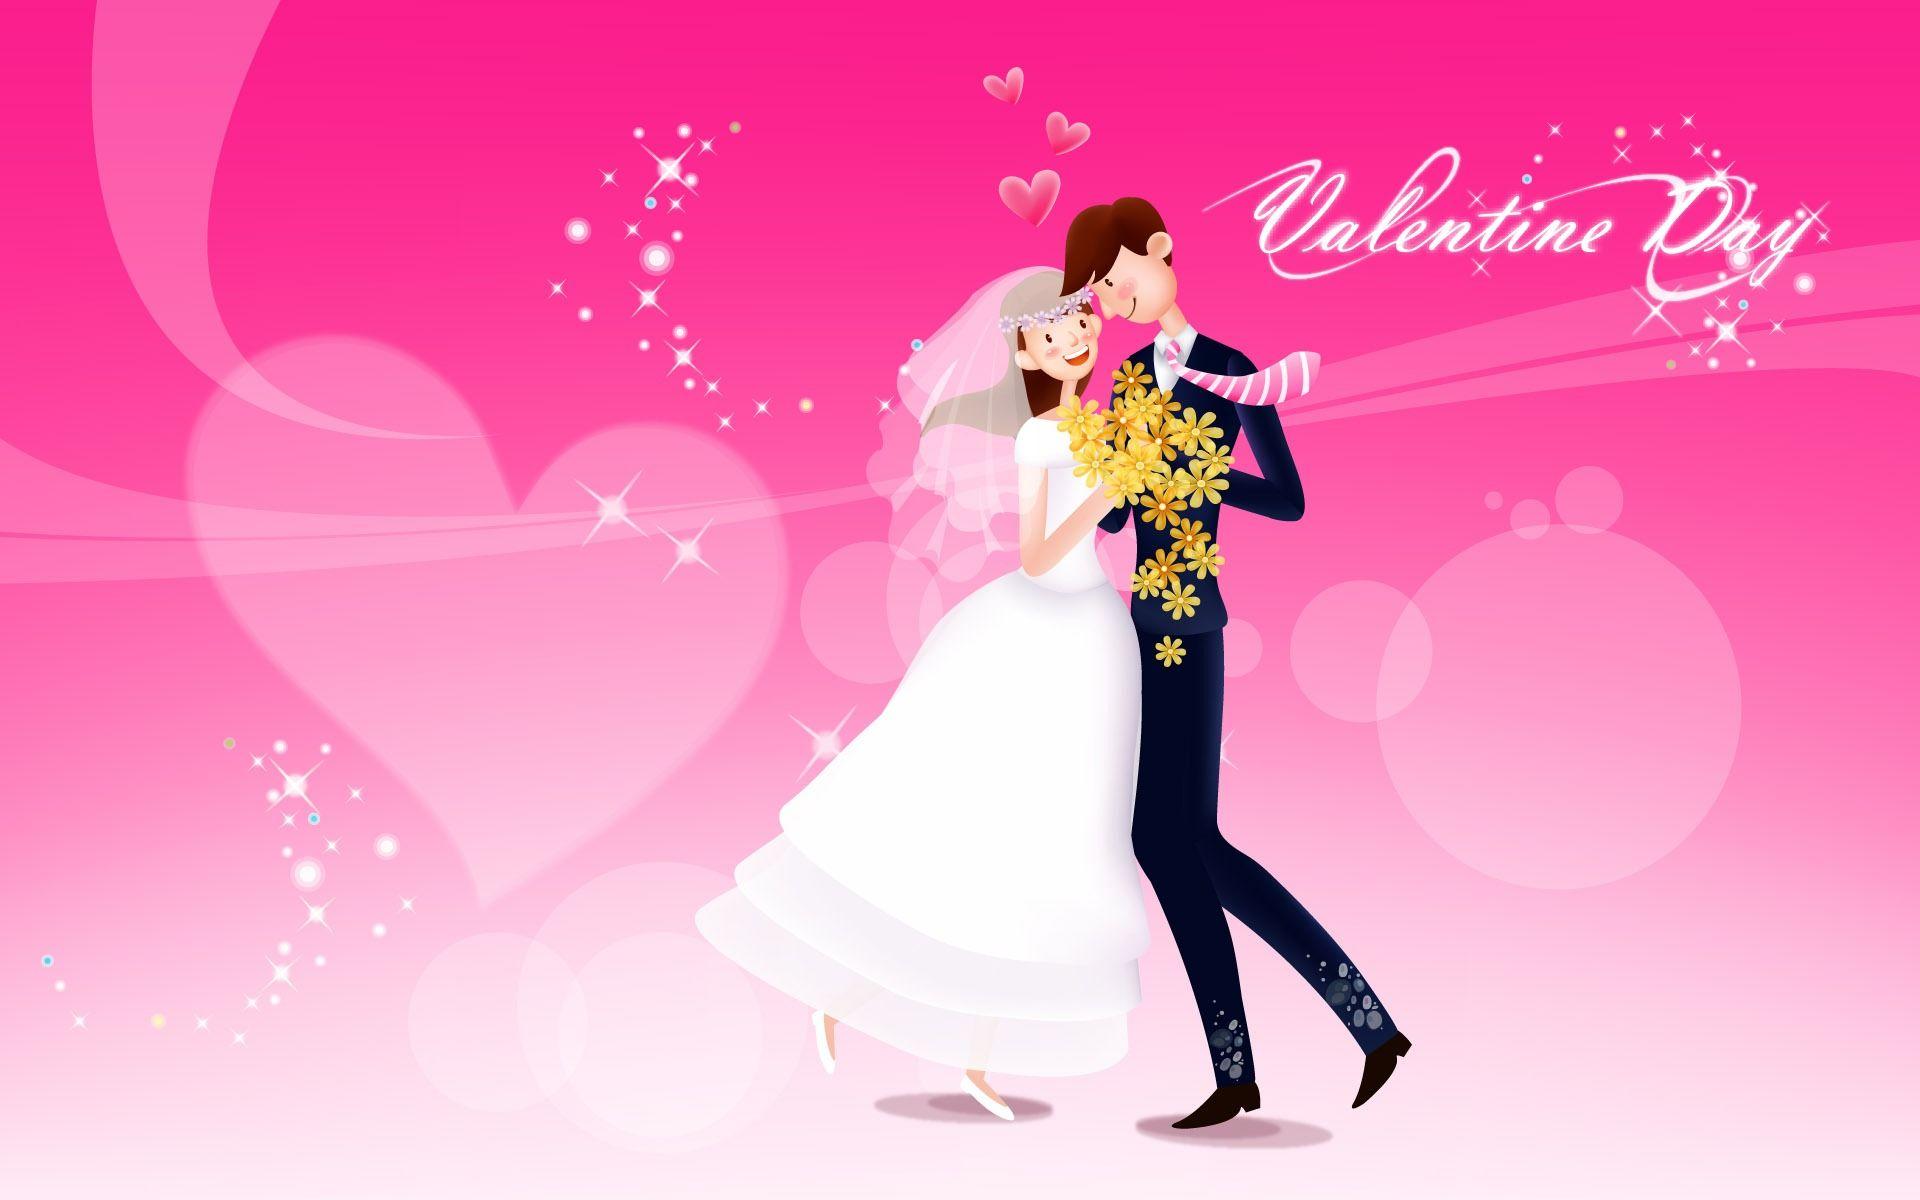 Hd Wallpaper Valentine Day Love